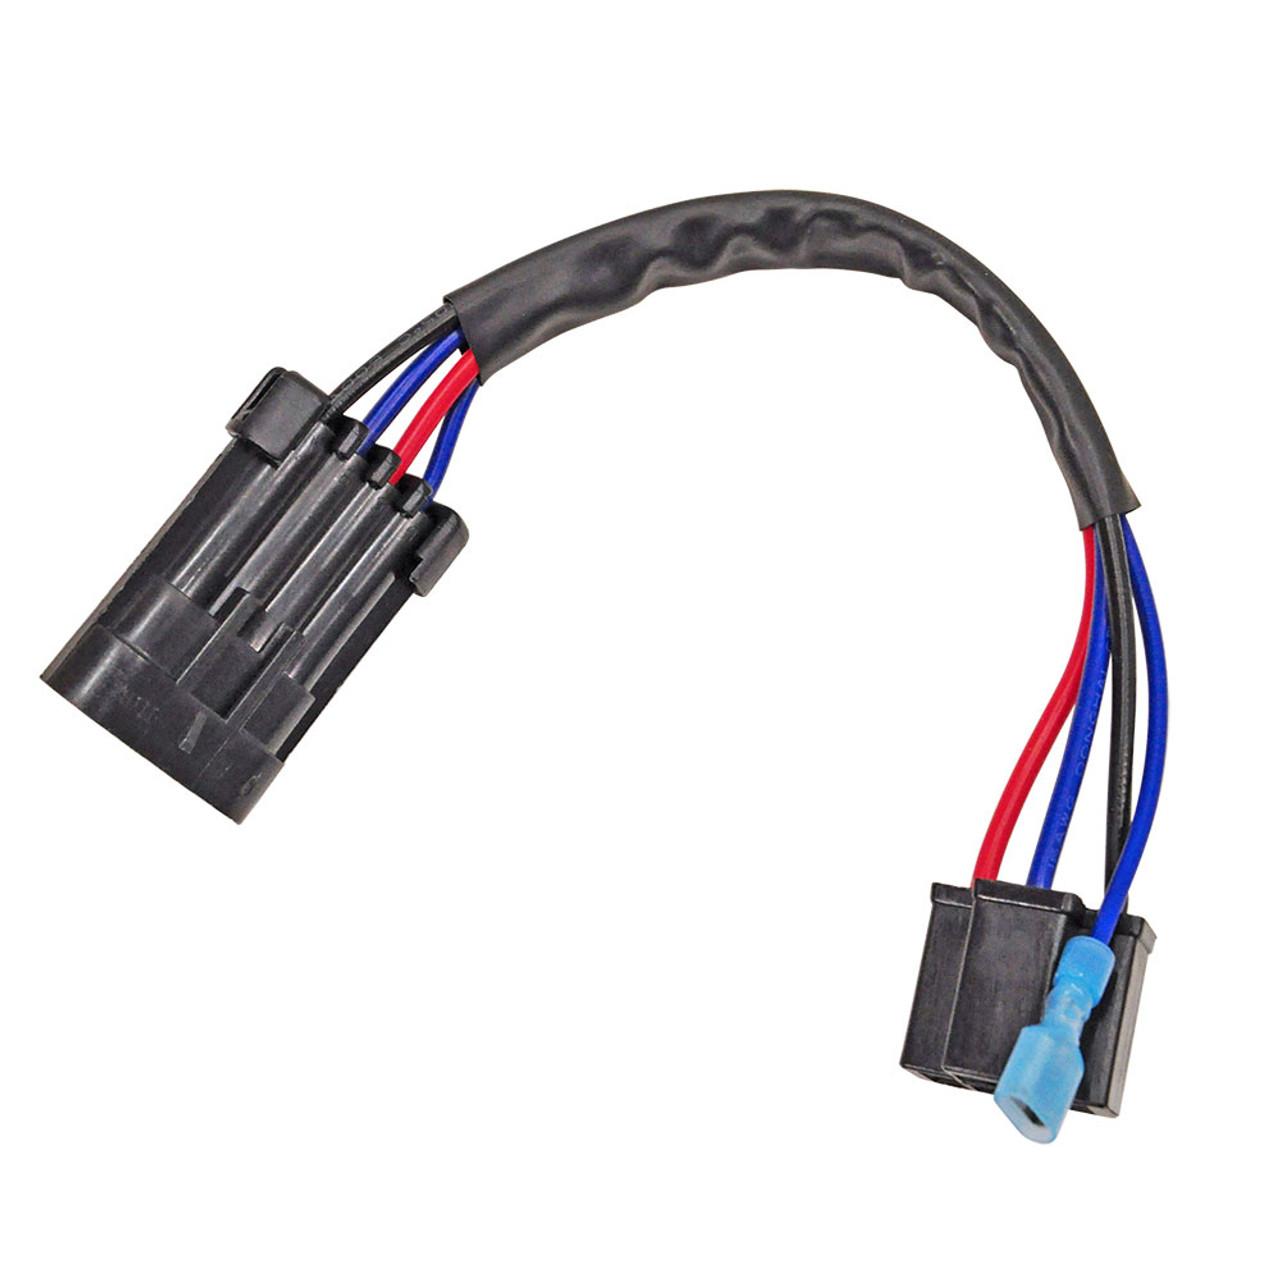 small resolution of custom dynamics led head lamp adaptor 1 33738 1554396576 jpg c 2 imbypass on